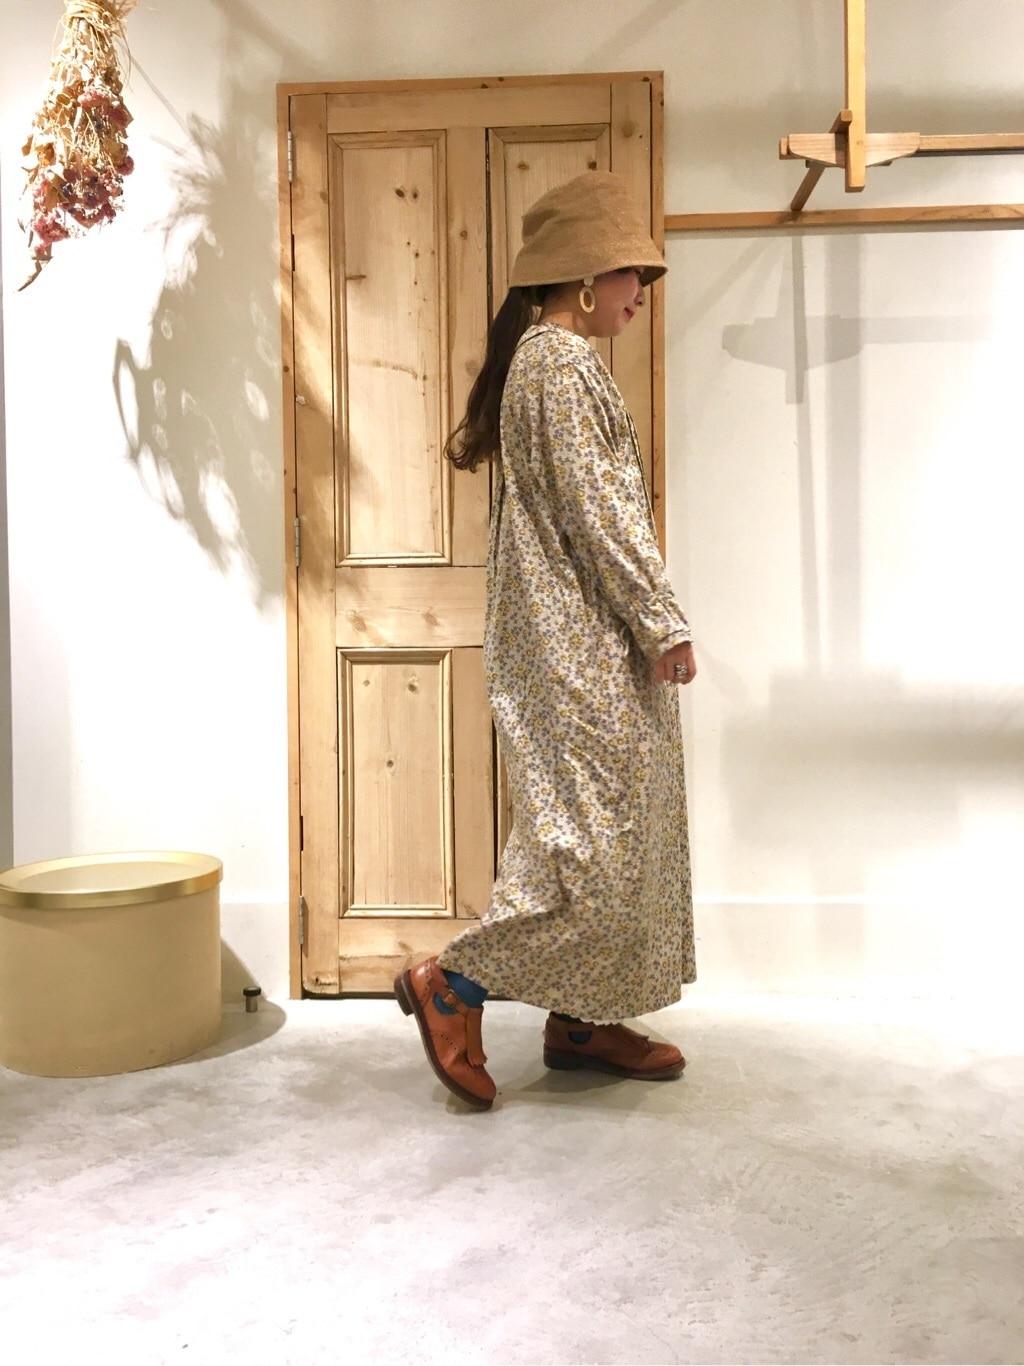 Malle chambre de charme 調布パルコ 身長:152cm 2020.02.28